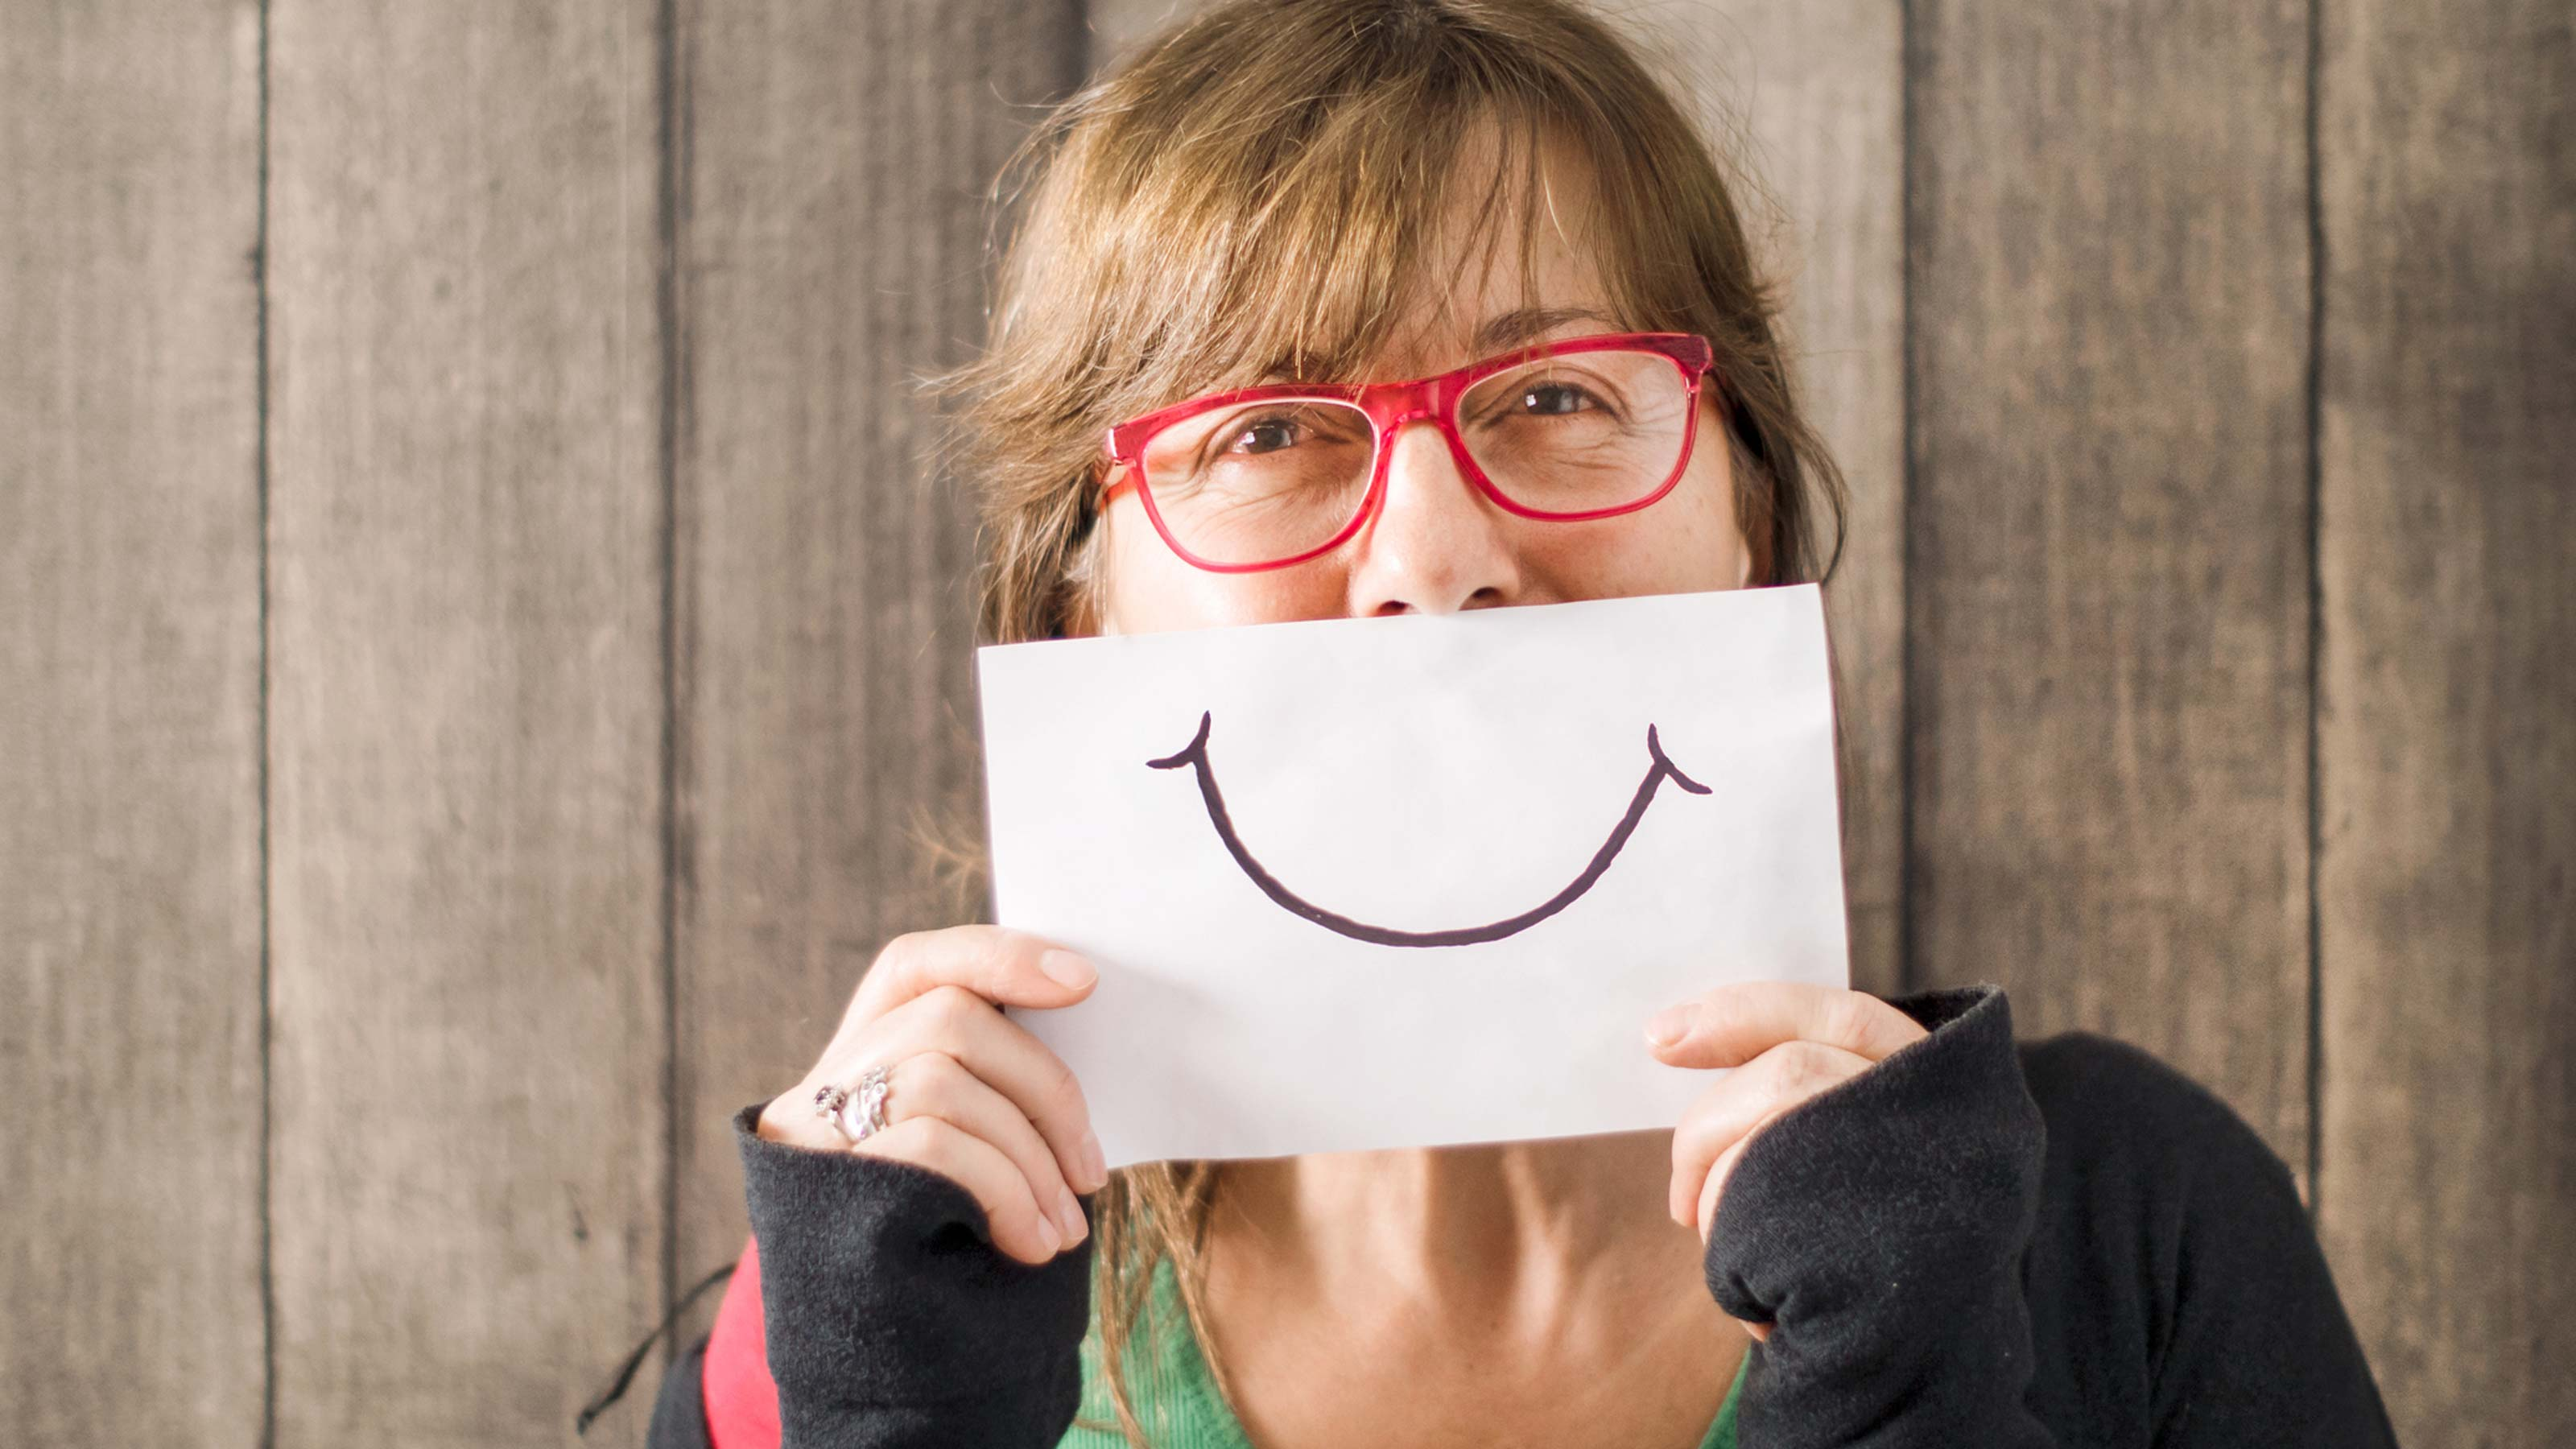 7 Surprisingly Valuable Assets for a Happy Retirement | Kiplinger